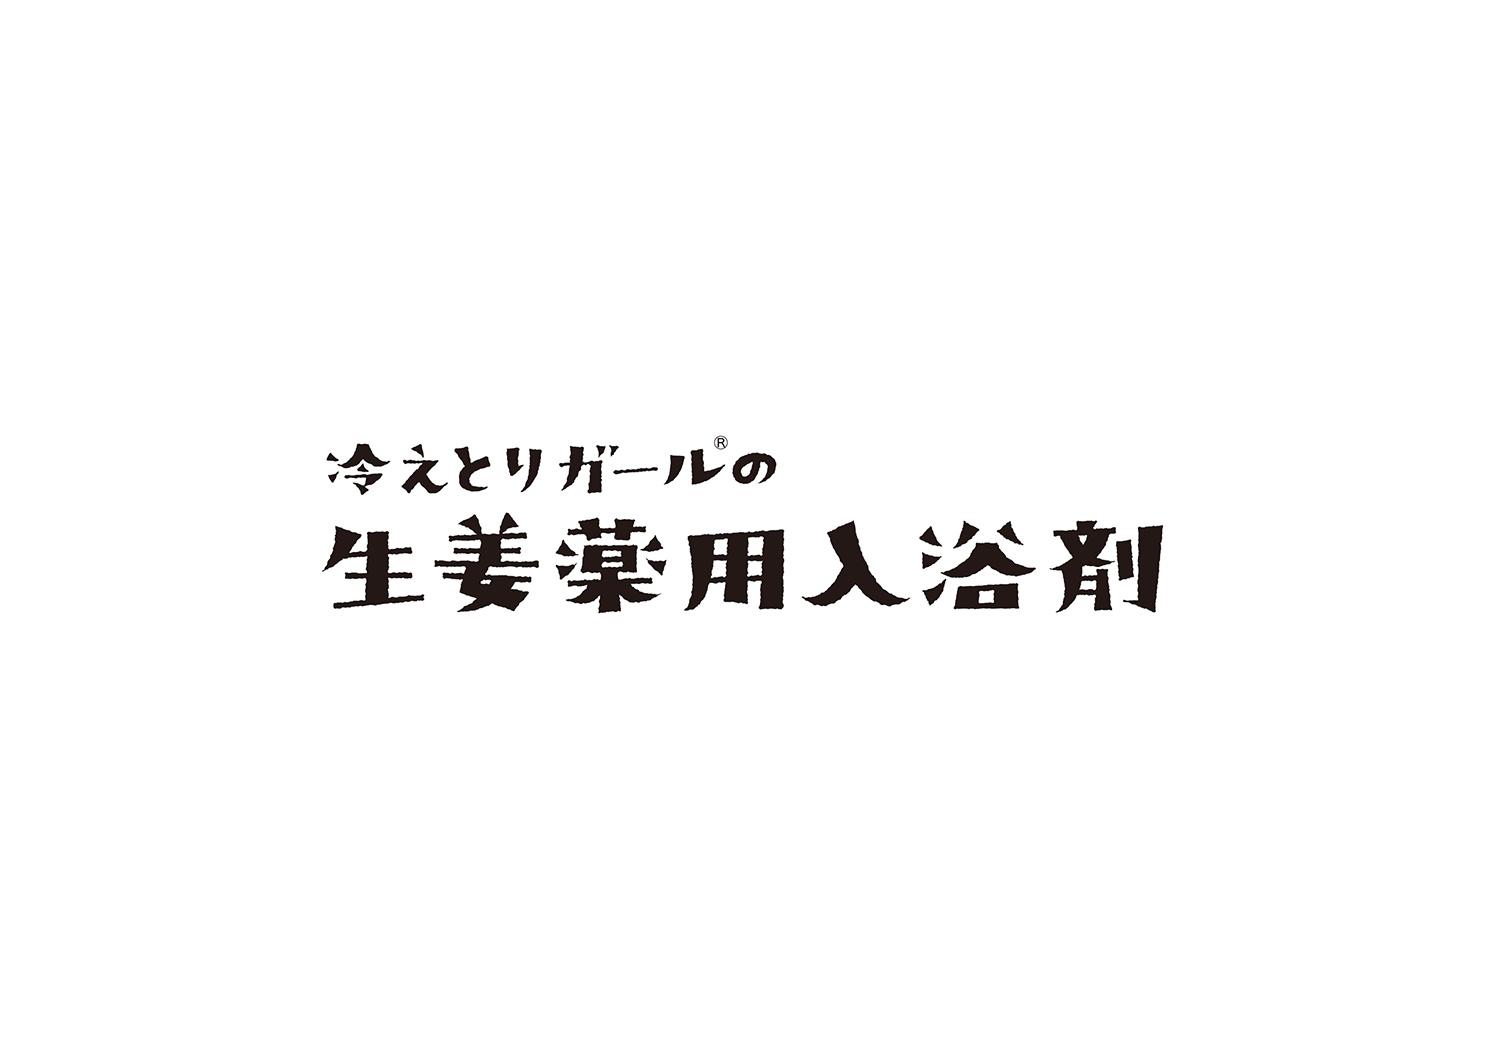 CHARLEY Hietori Girl Ginger Medicated Bath Additives Logo